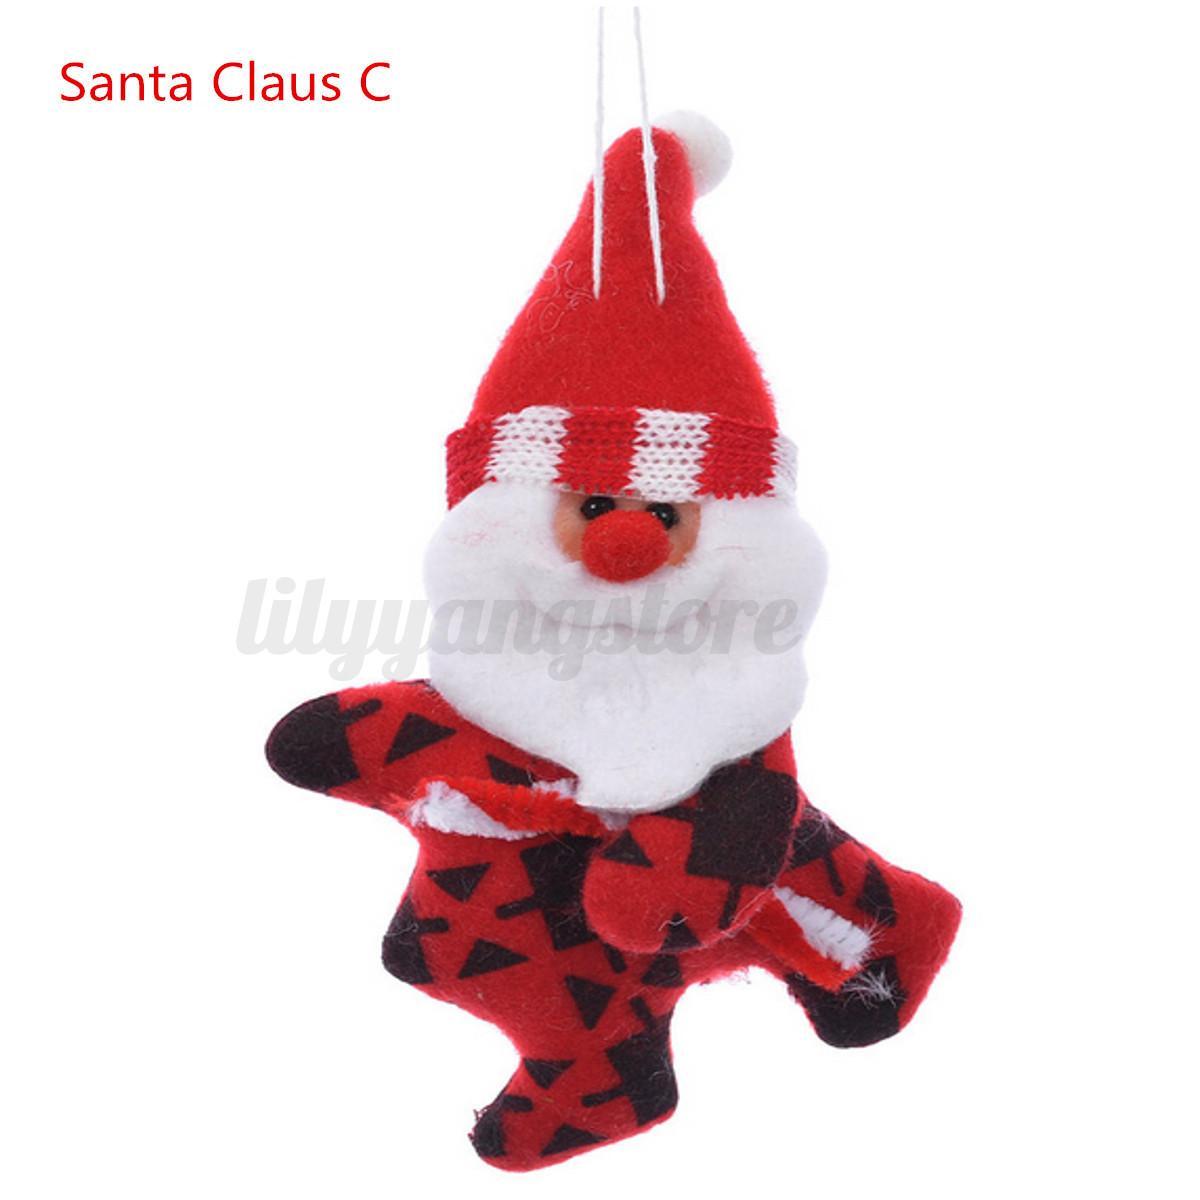 Santa Claus Toys : Christmas santa claus stuffed plush doll toy ornament xmas